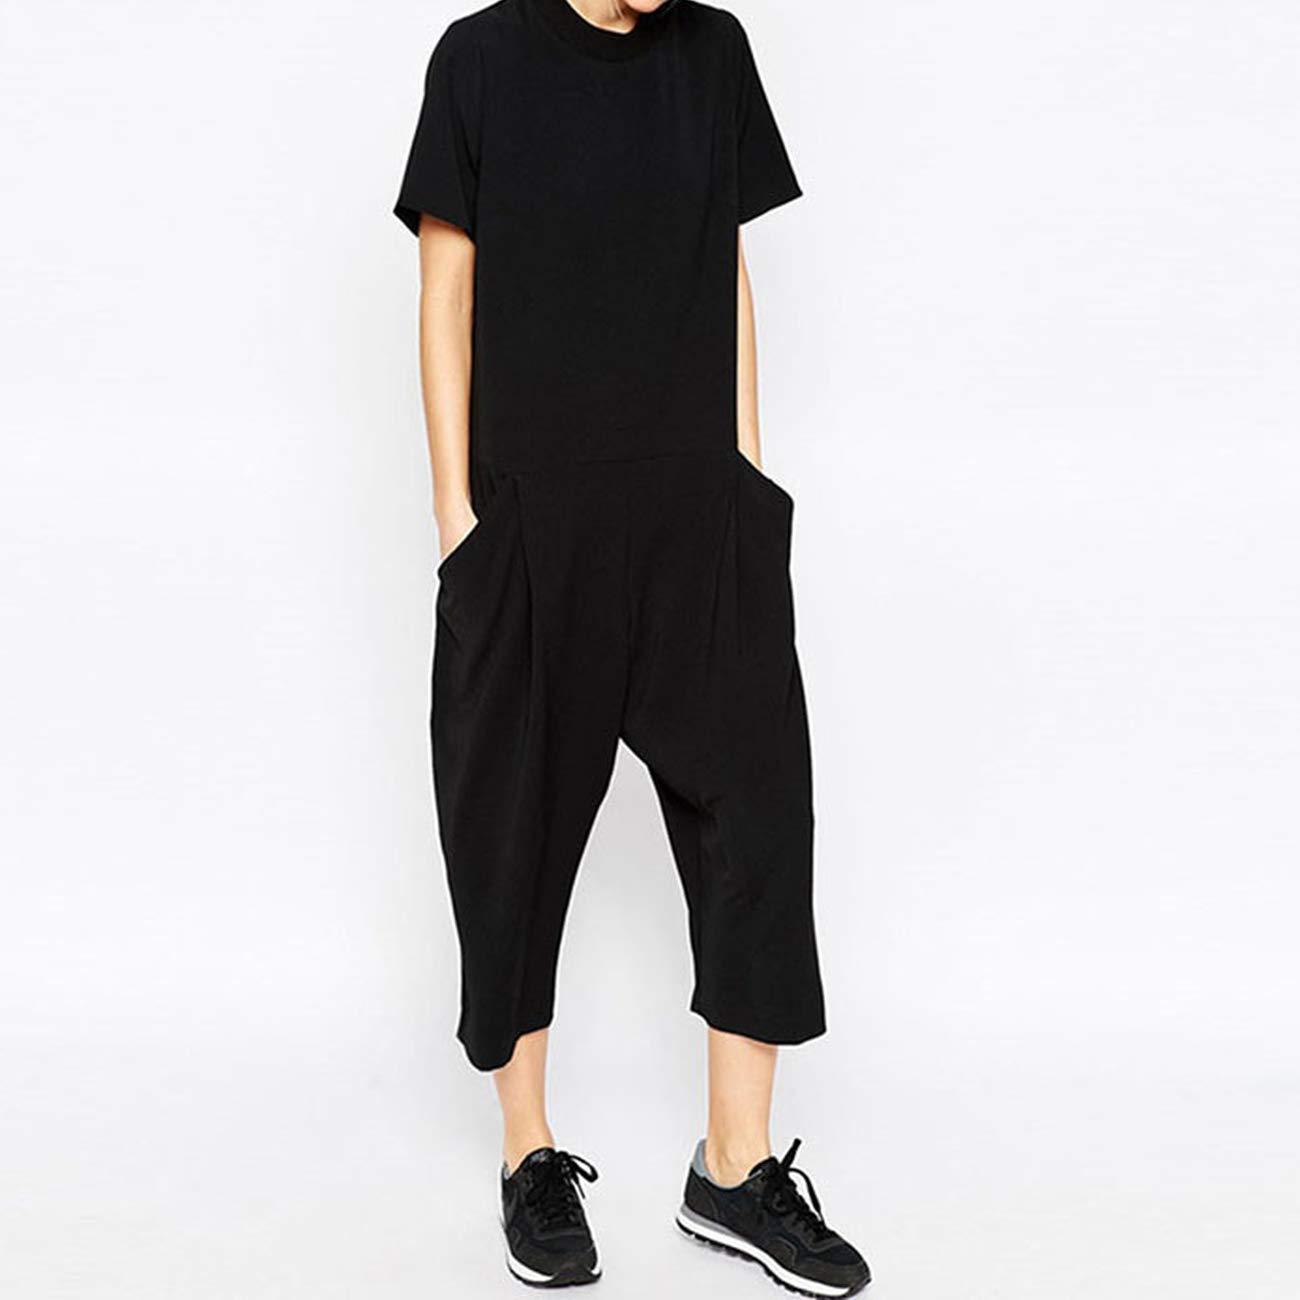 Dreamture Women Jumpsuit Elegant Side Pocket Loose Fitting Combinaison Femme Romper Overalls Jumpsuit for Women